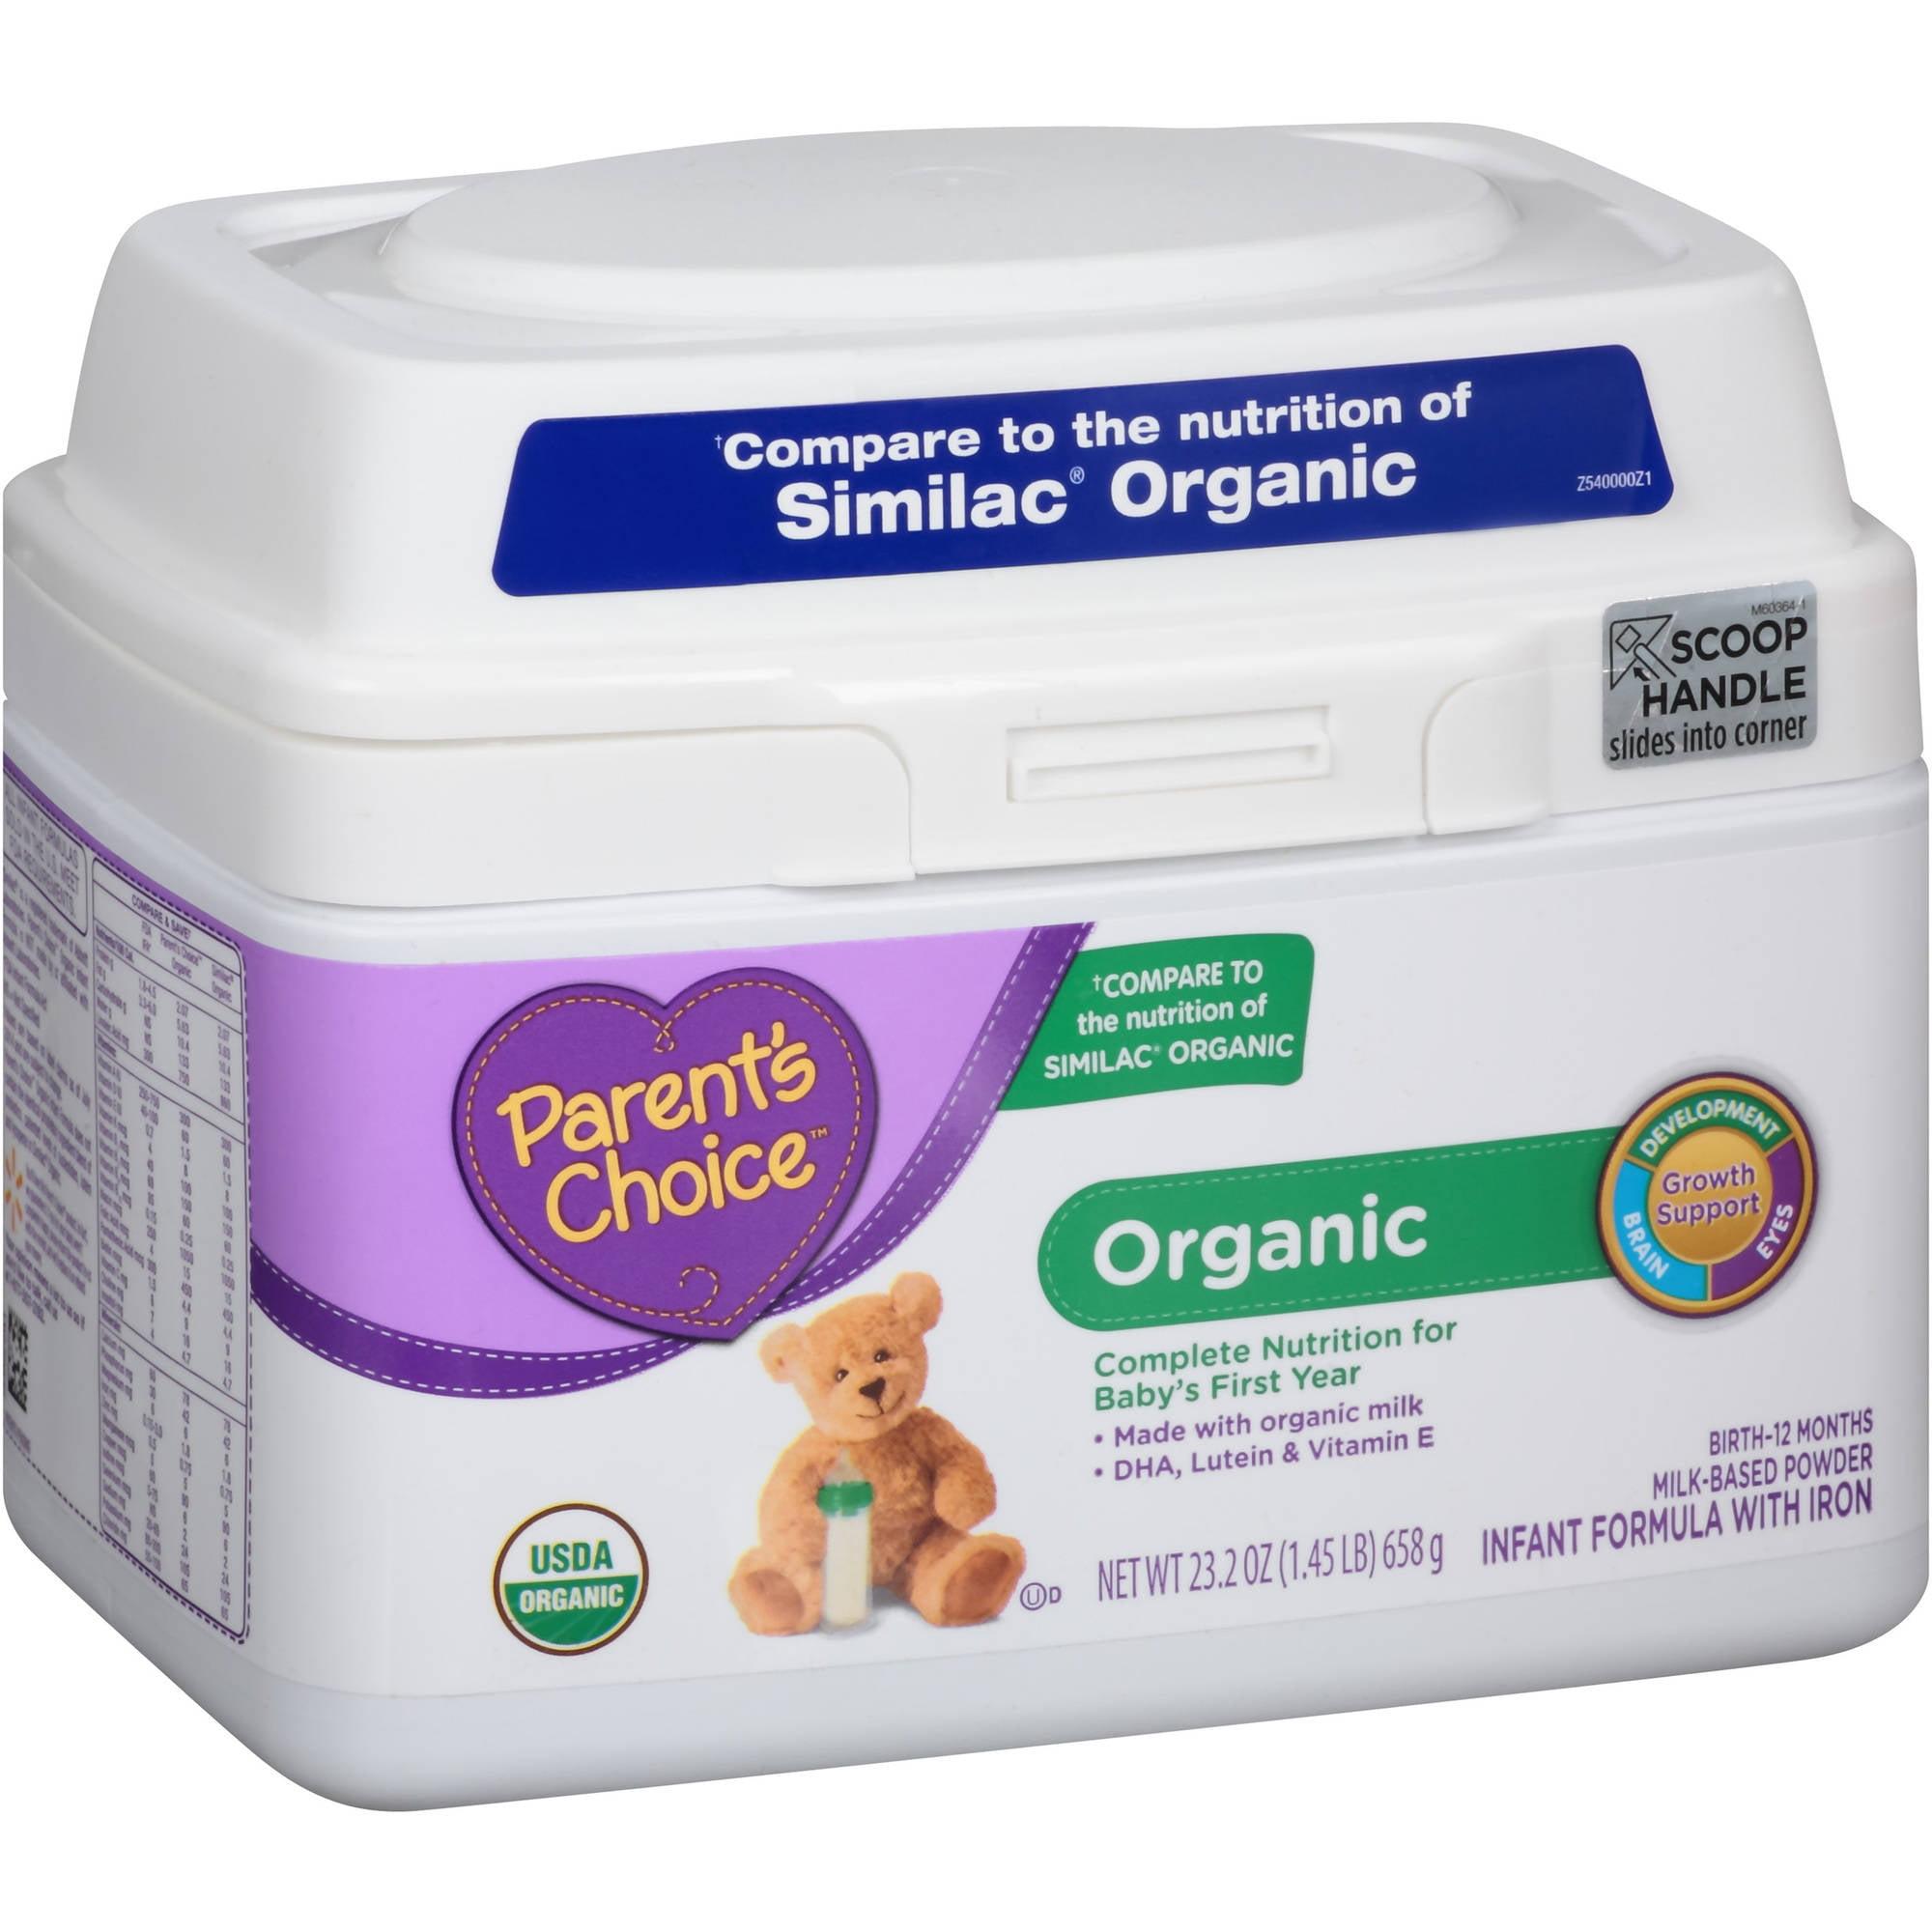 Parent's Choice Organic Milk-Based Powder Infant Formula with Iron, 23.2 oz, (Pack of 4)